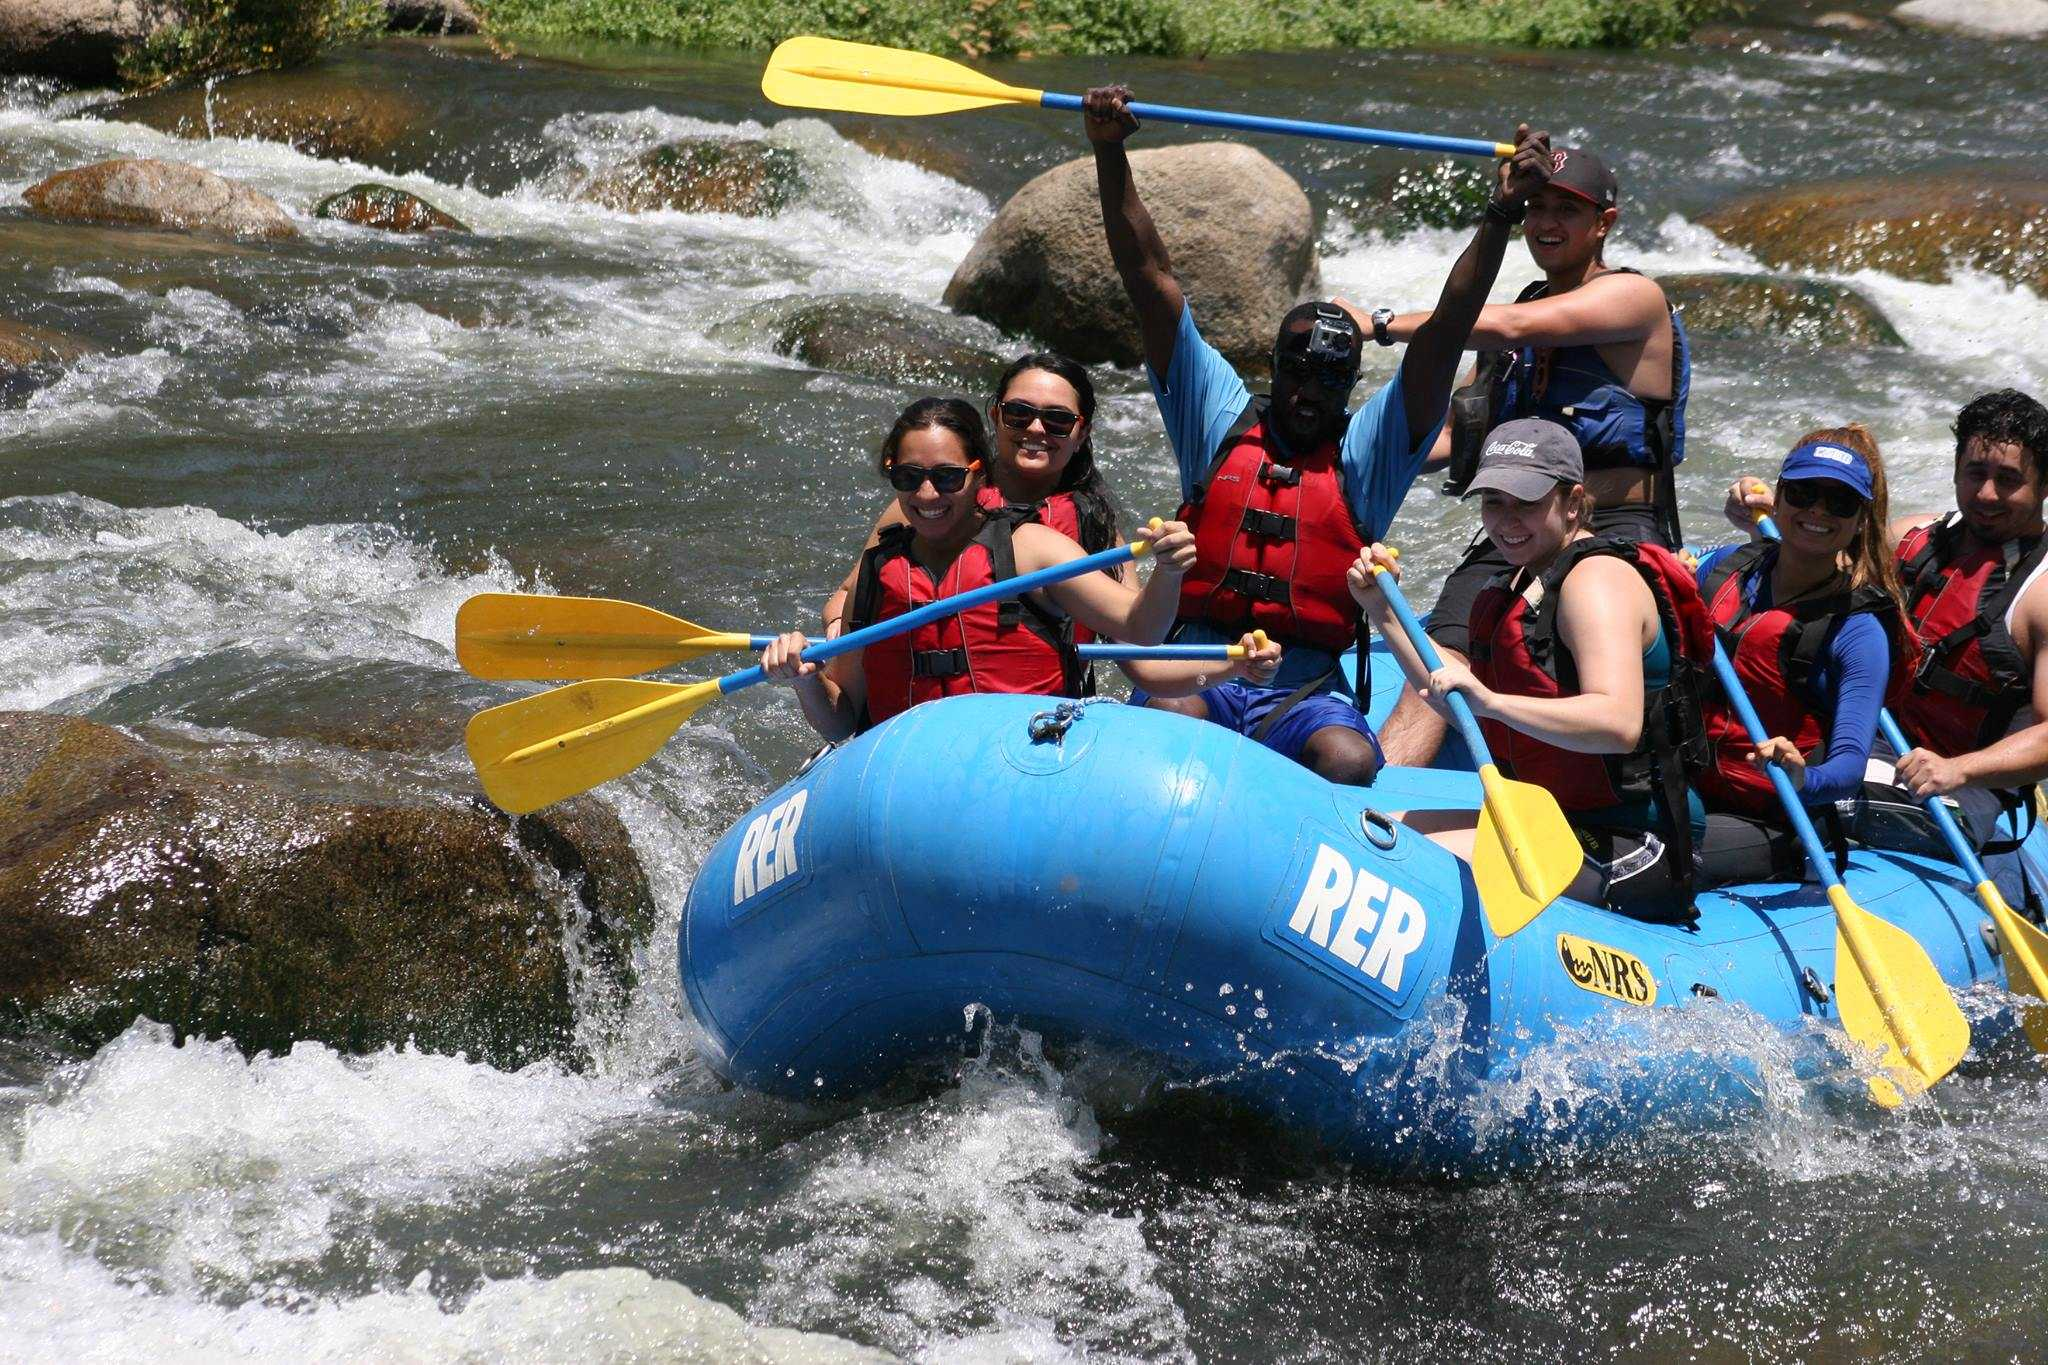 CSUB program provides outdoor fun